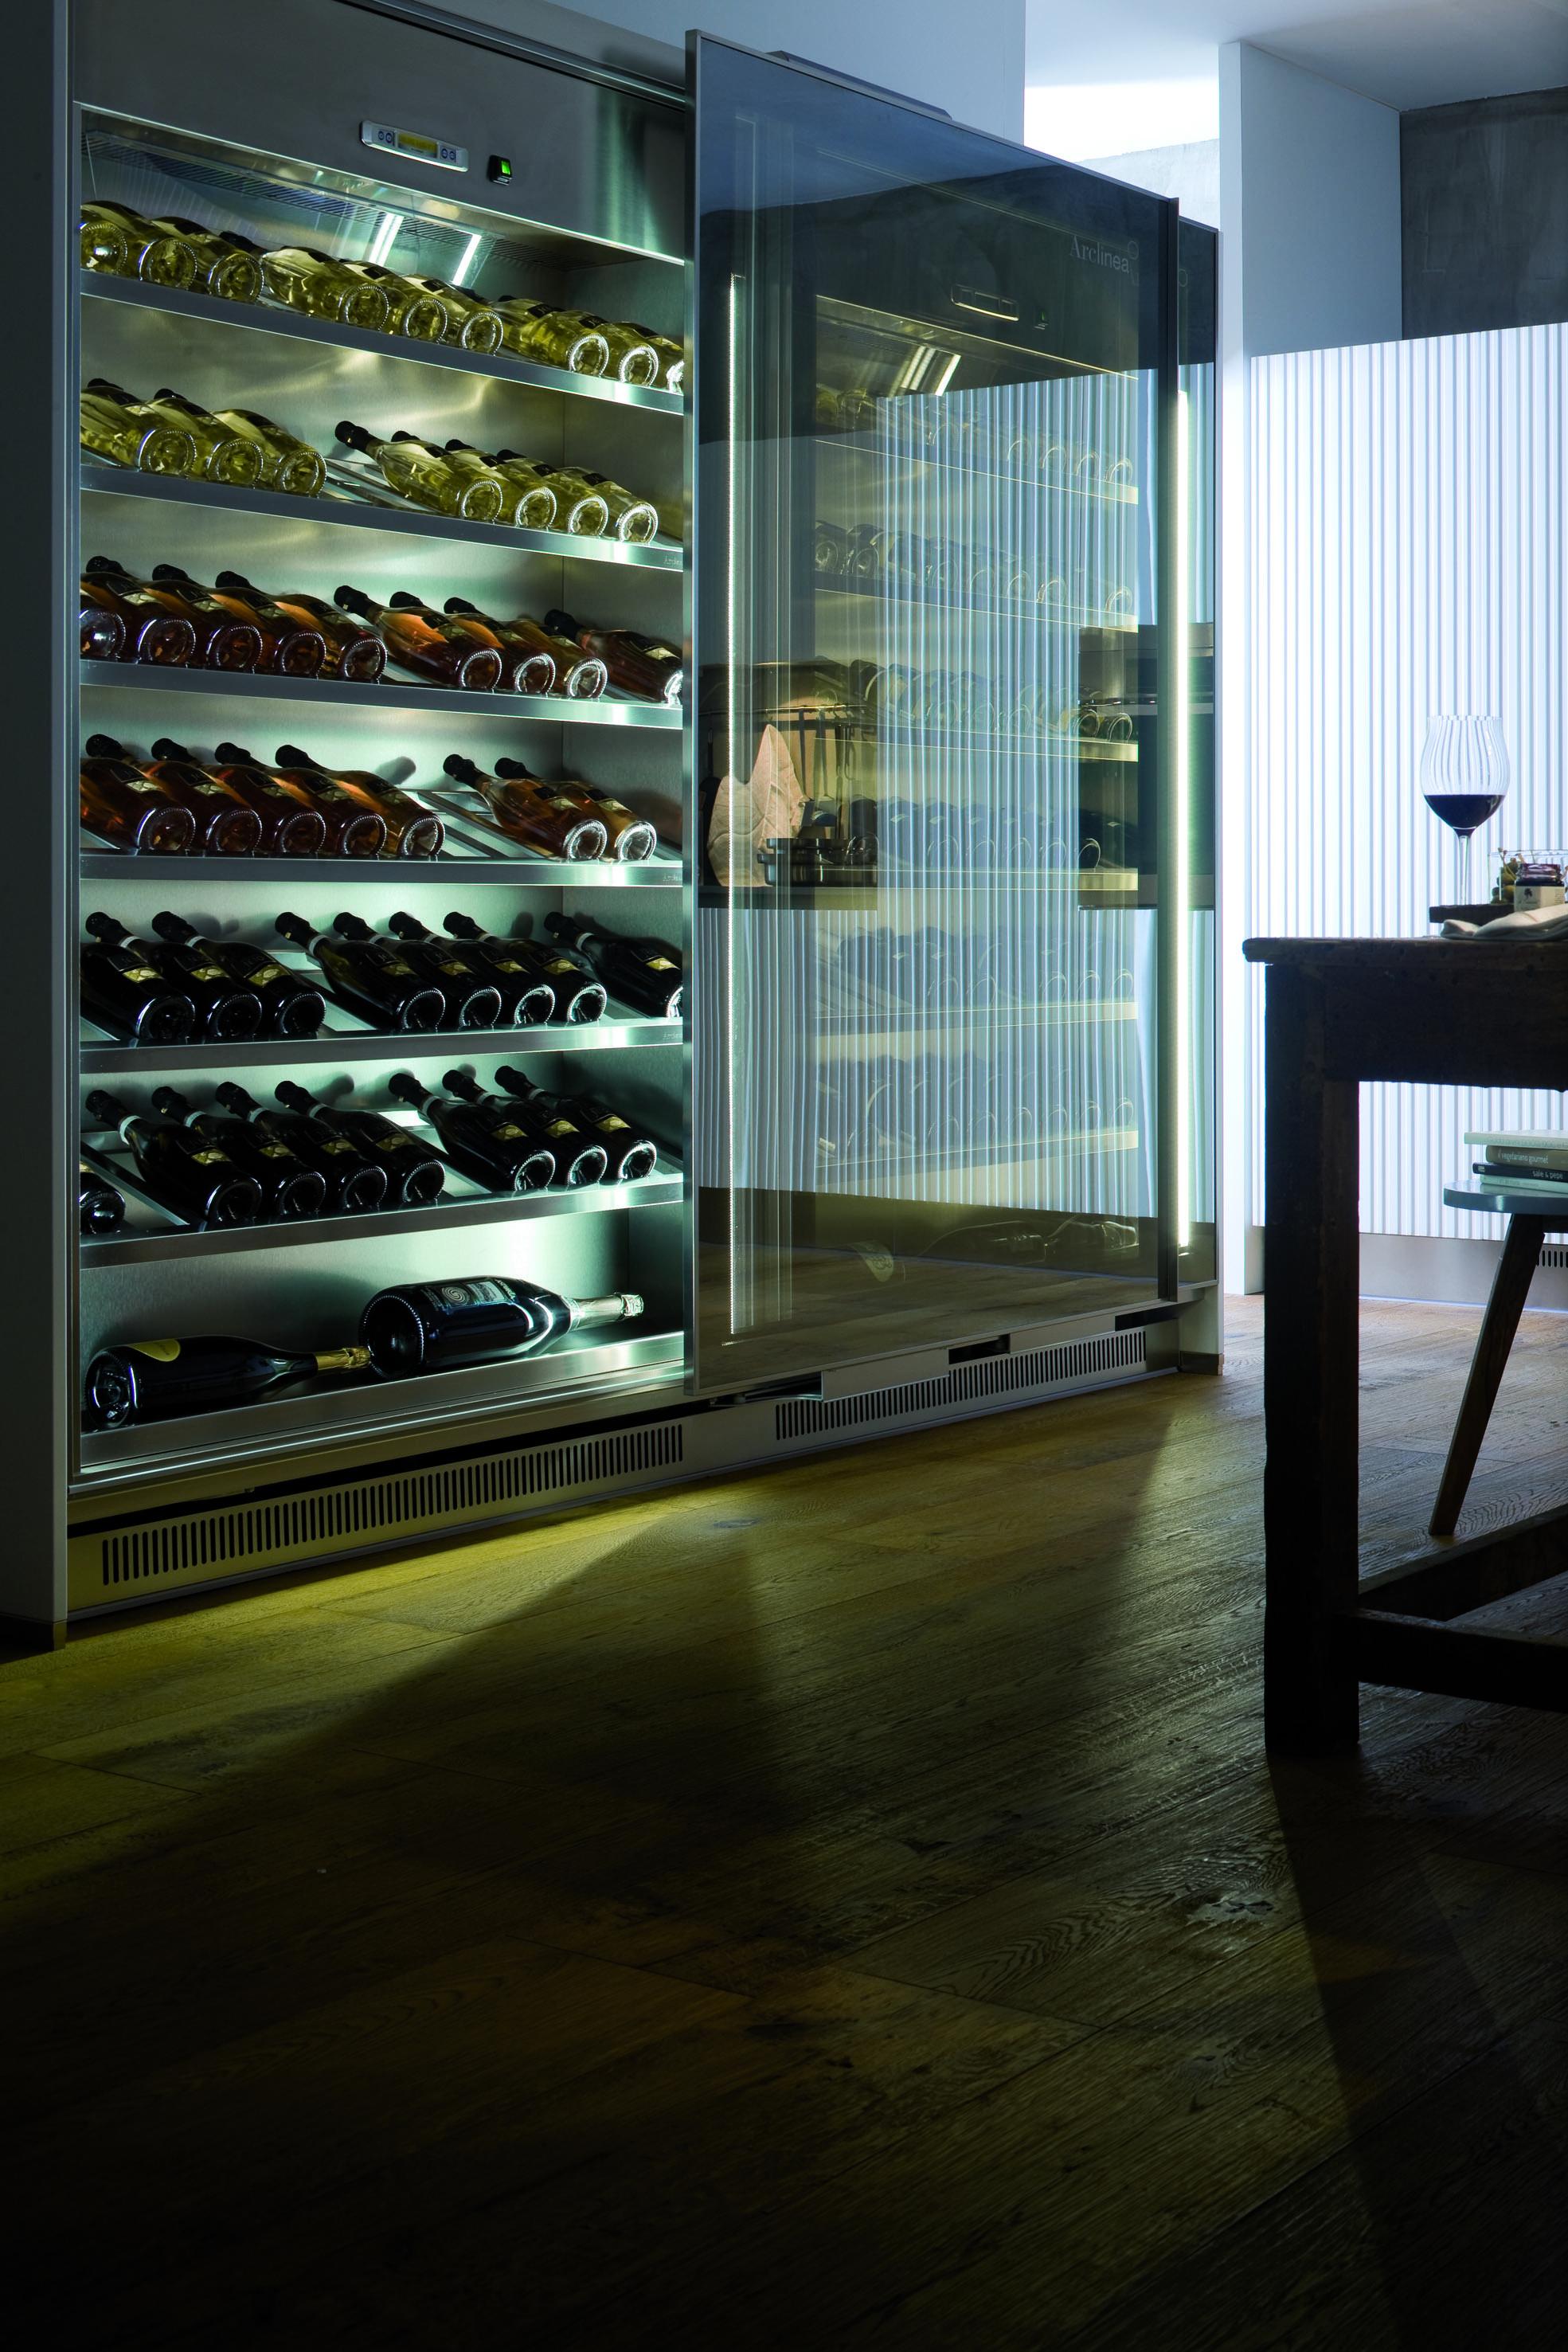 Arredare cantina beautiful arredare una taverna elegante cantina ristorante a bellissimo arredo - Mobili per cantine ...